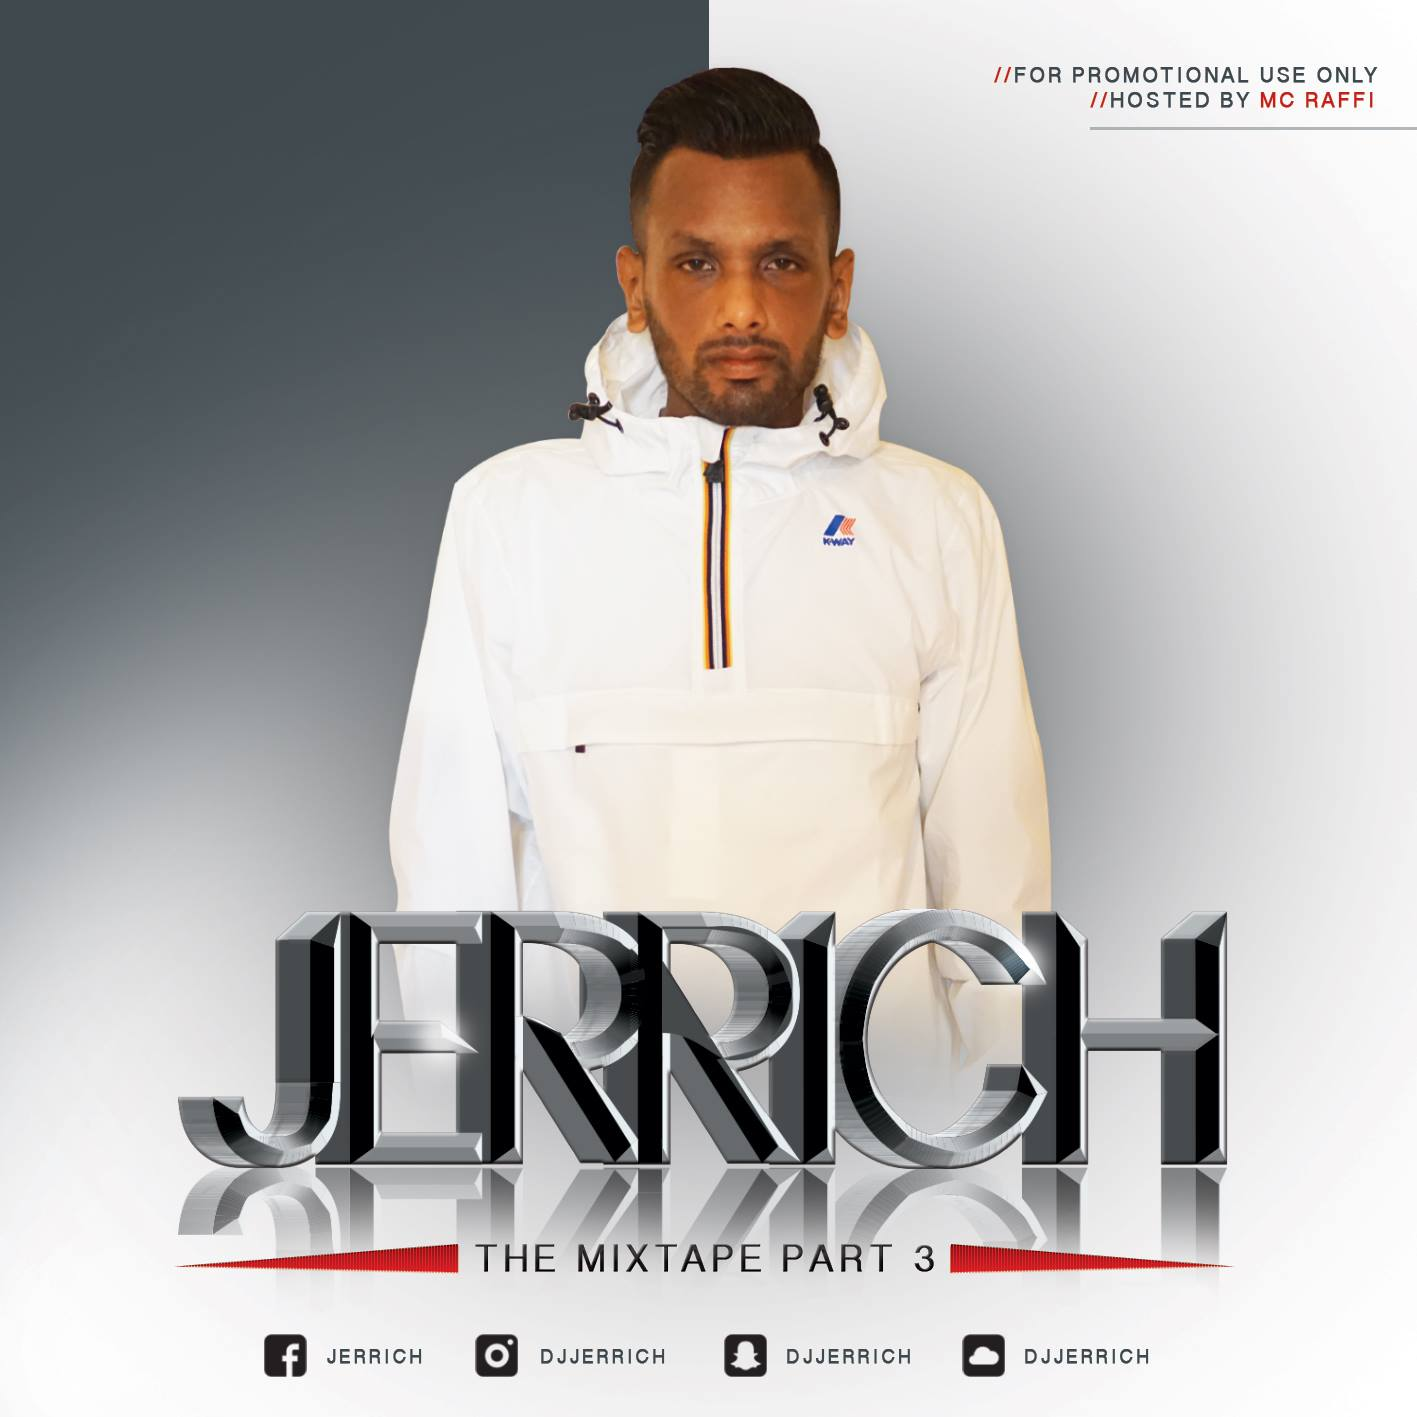 Jerrich